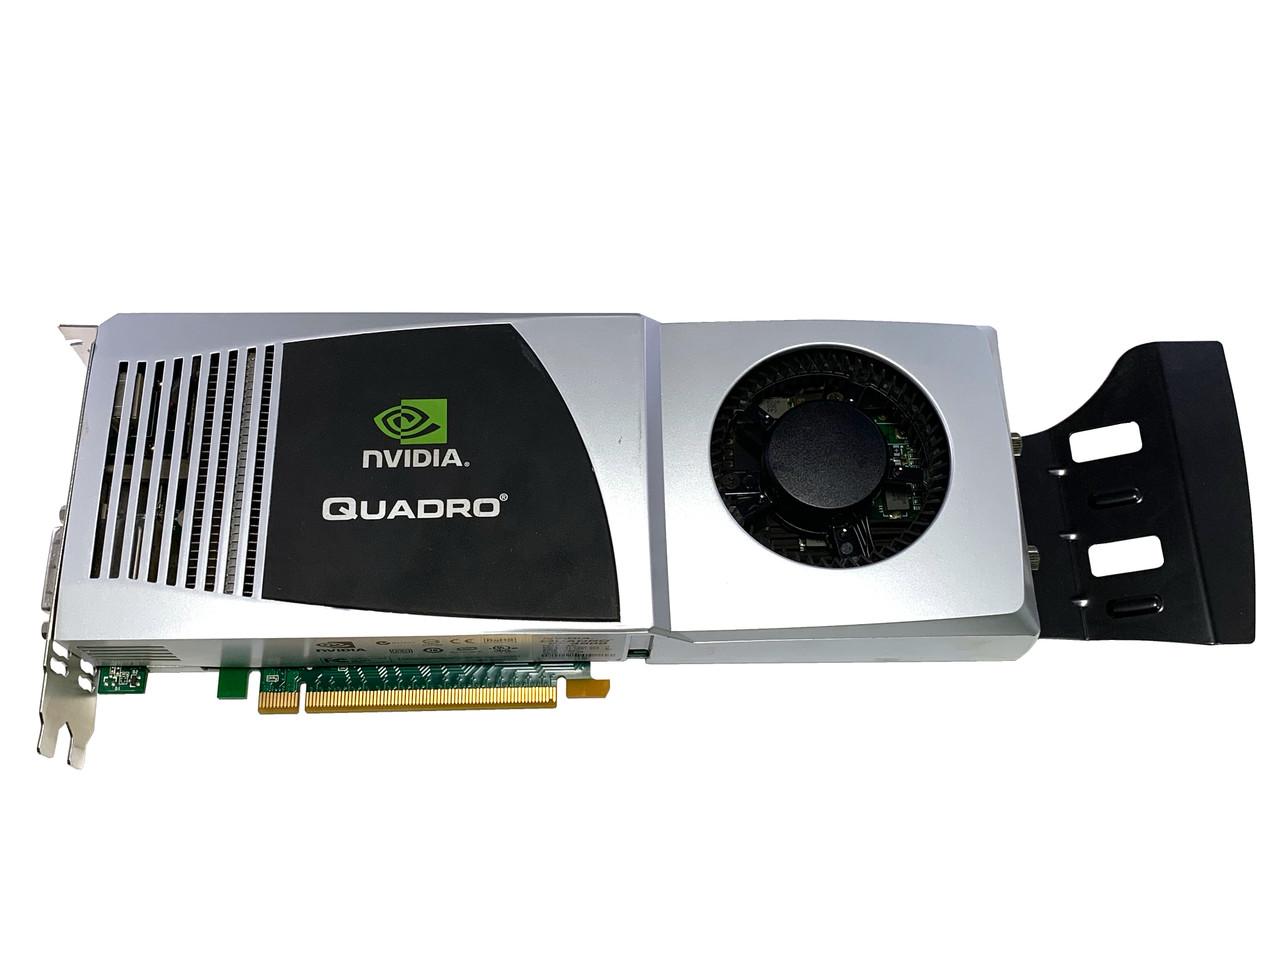 HP NVidia Quadro FX 4800 1.5GB PCI-E x16 DVI-I Port Graphics Card